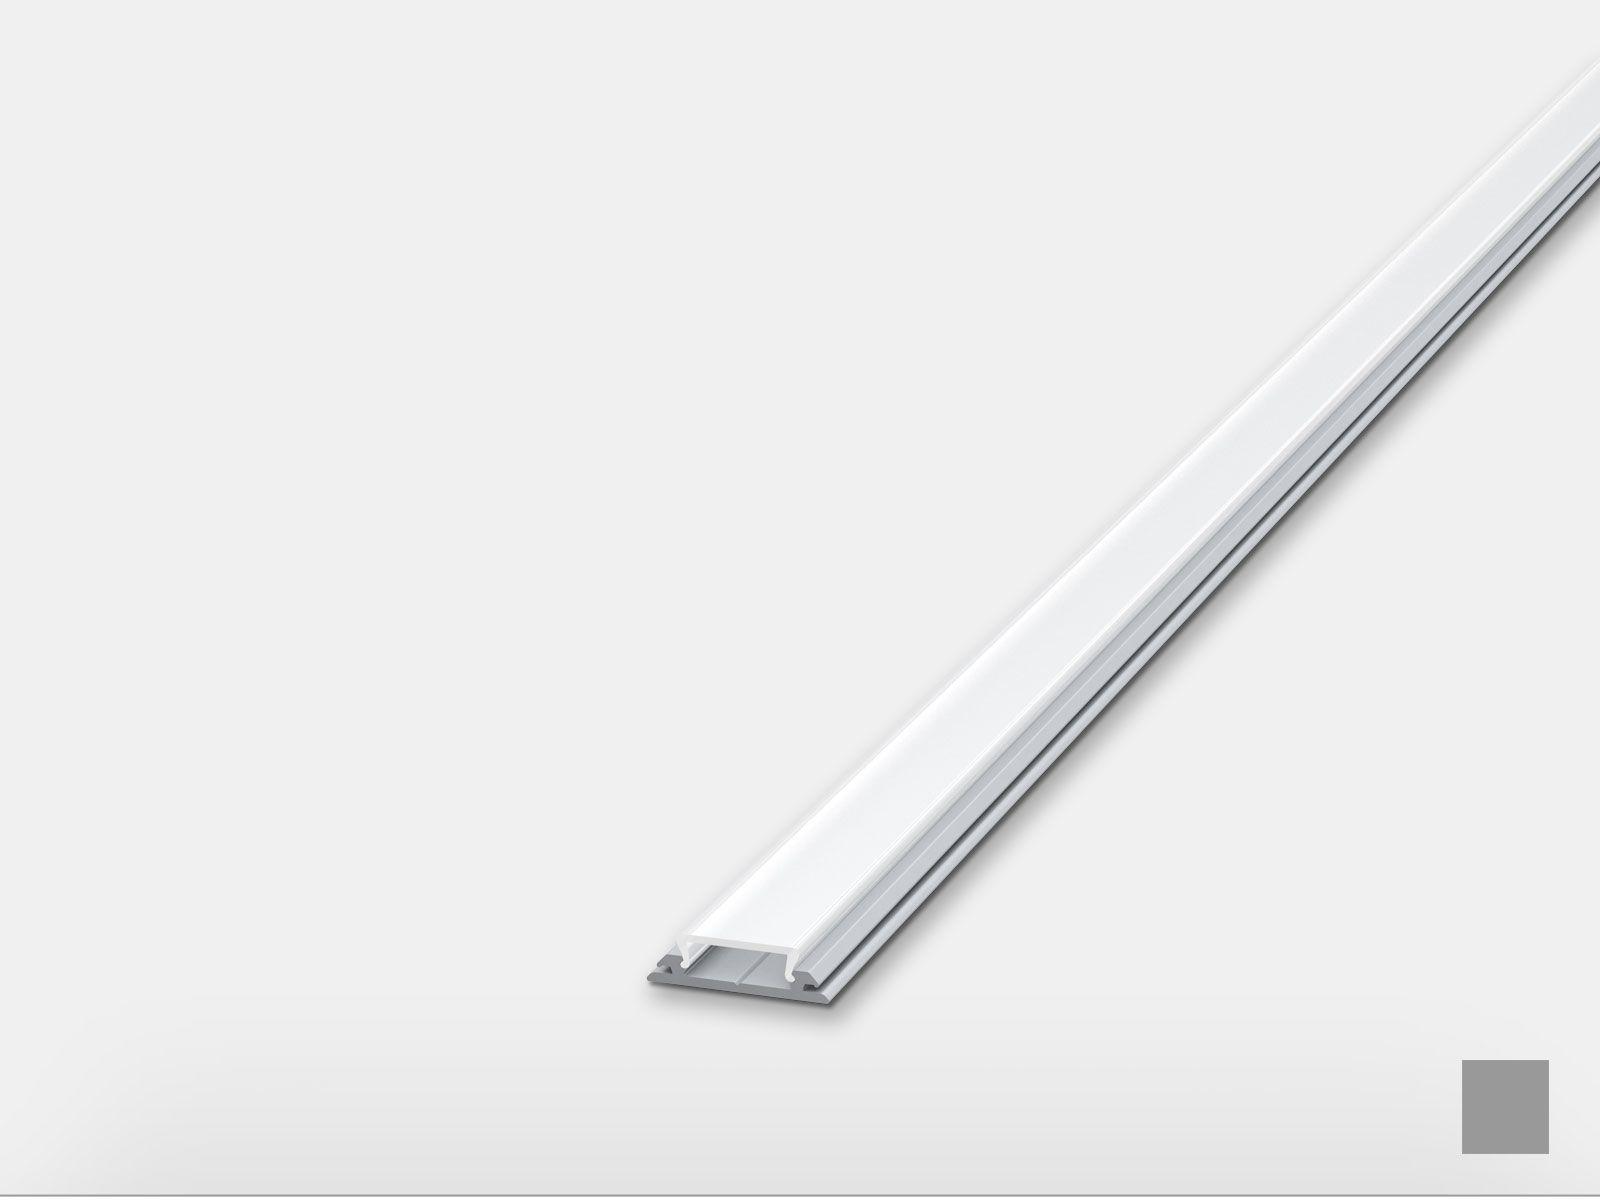 Das Superflache Led Alu Profil Flex Mini Ist Biegb 3 00 Led Led Deckenbeleuchtung Led Stripes